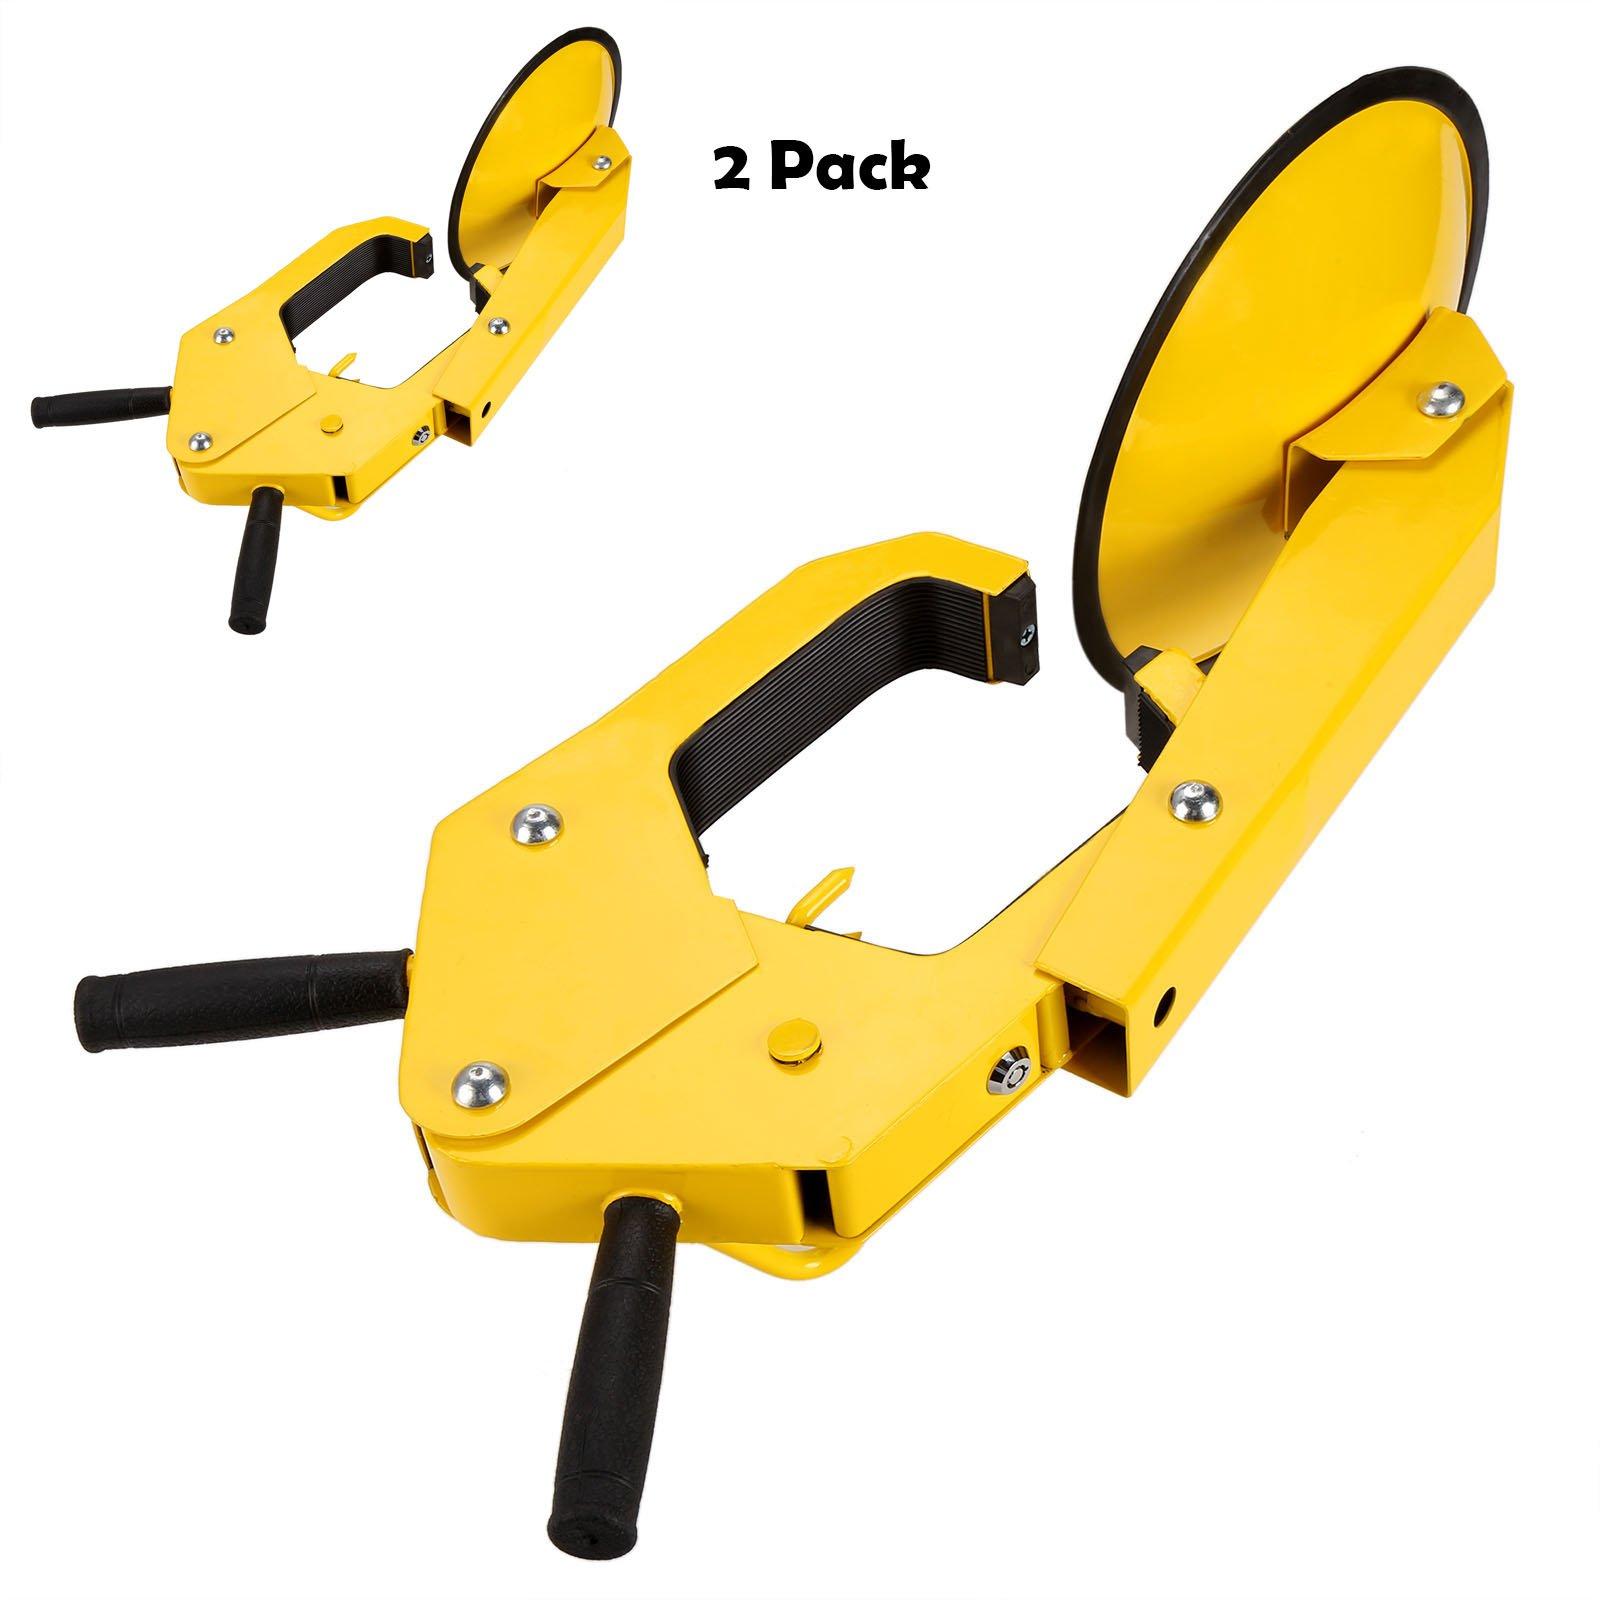 Oanon Wheel Lock Clamp Boot Tire Claw Auto Car Truck ATV, RV, Boat Trailers Heavy Duty Secure (2 Pack)